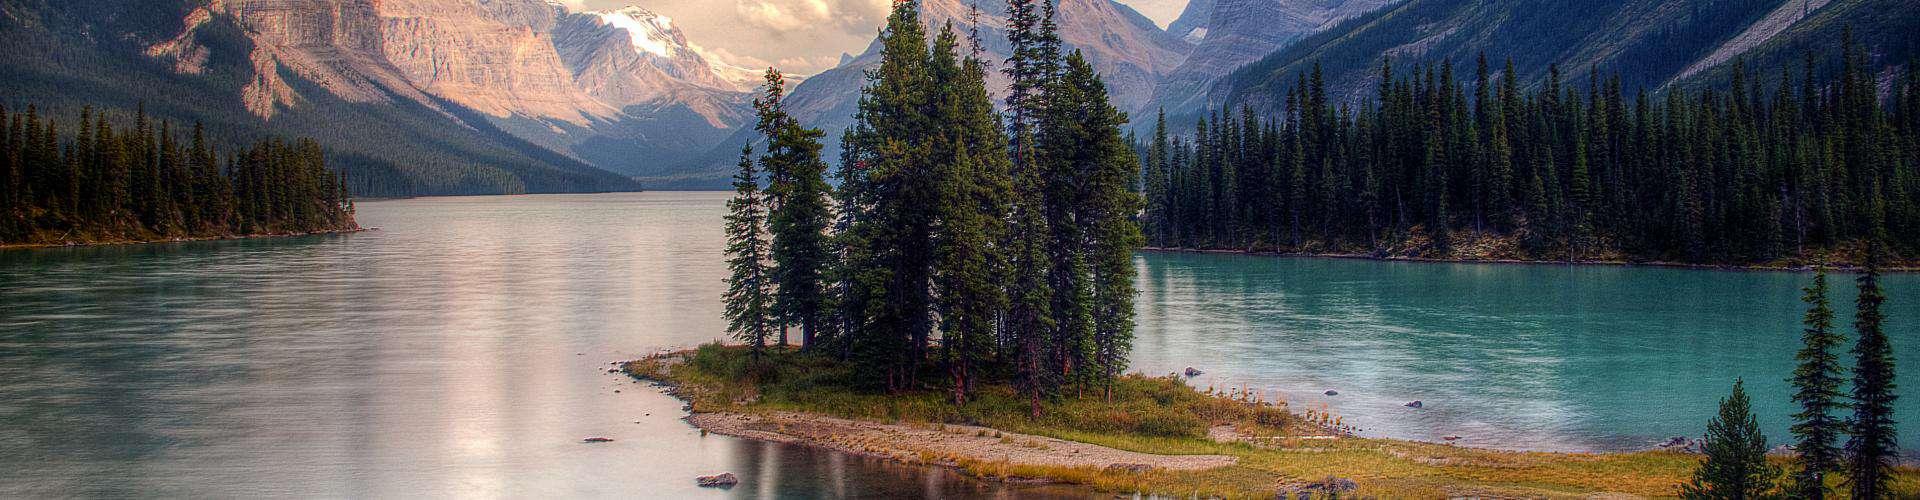 Jasper National Park, Canada - Risskov Rejser